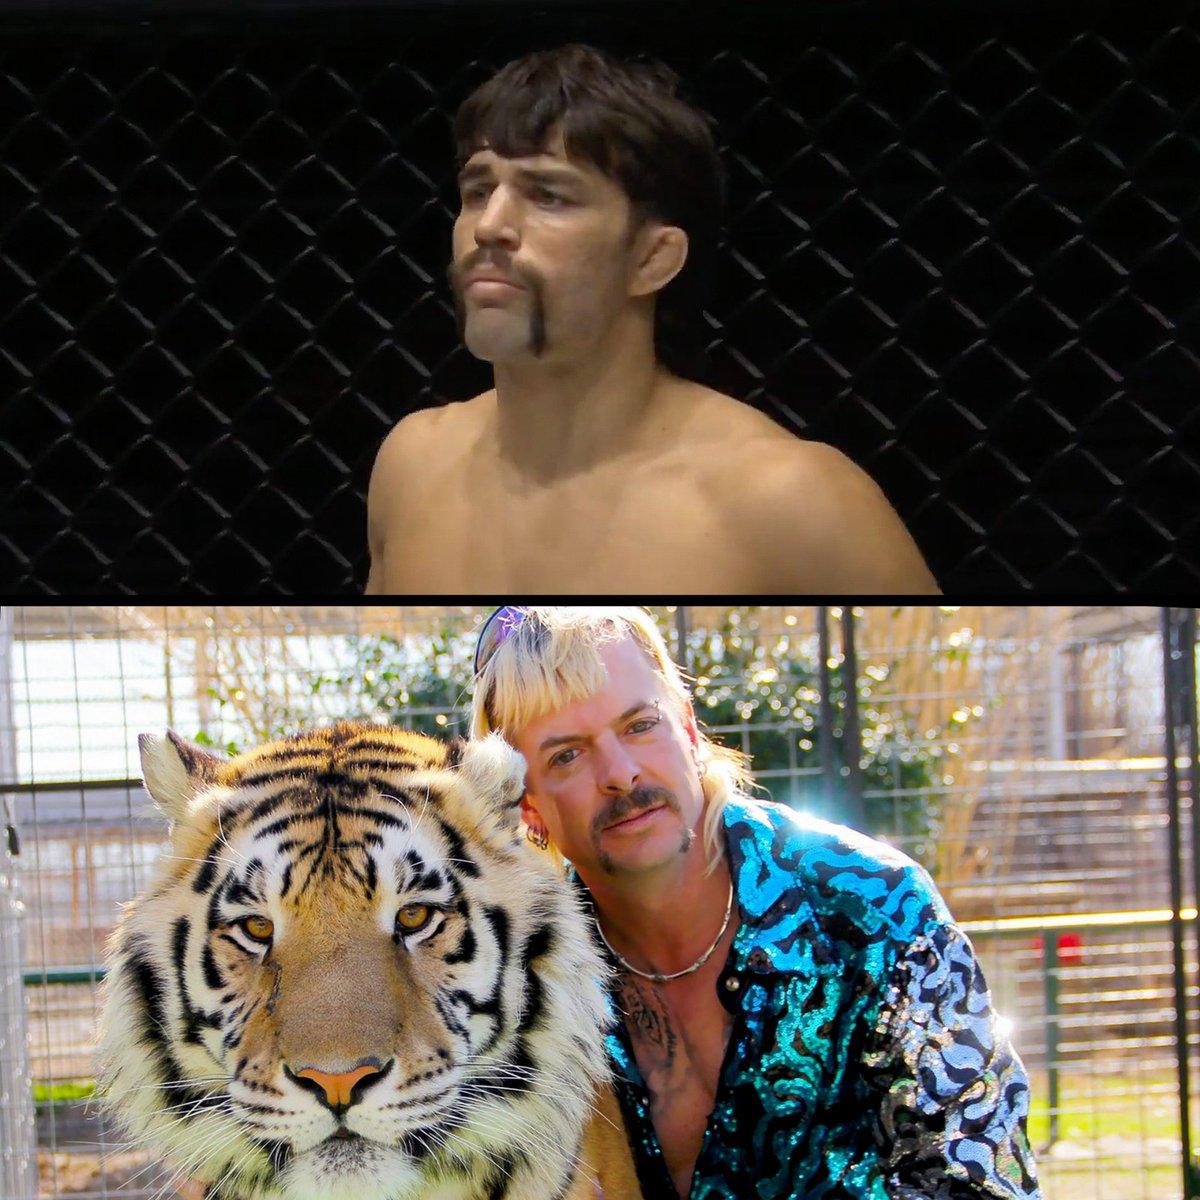 """Lion Killer""... or Tiger King? 🤠 @Garry_Tonon @joe_exotic #ONEBigBang #WeAreONE #ONEChampionship"